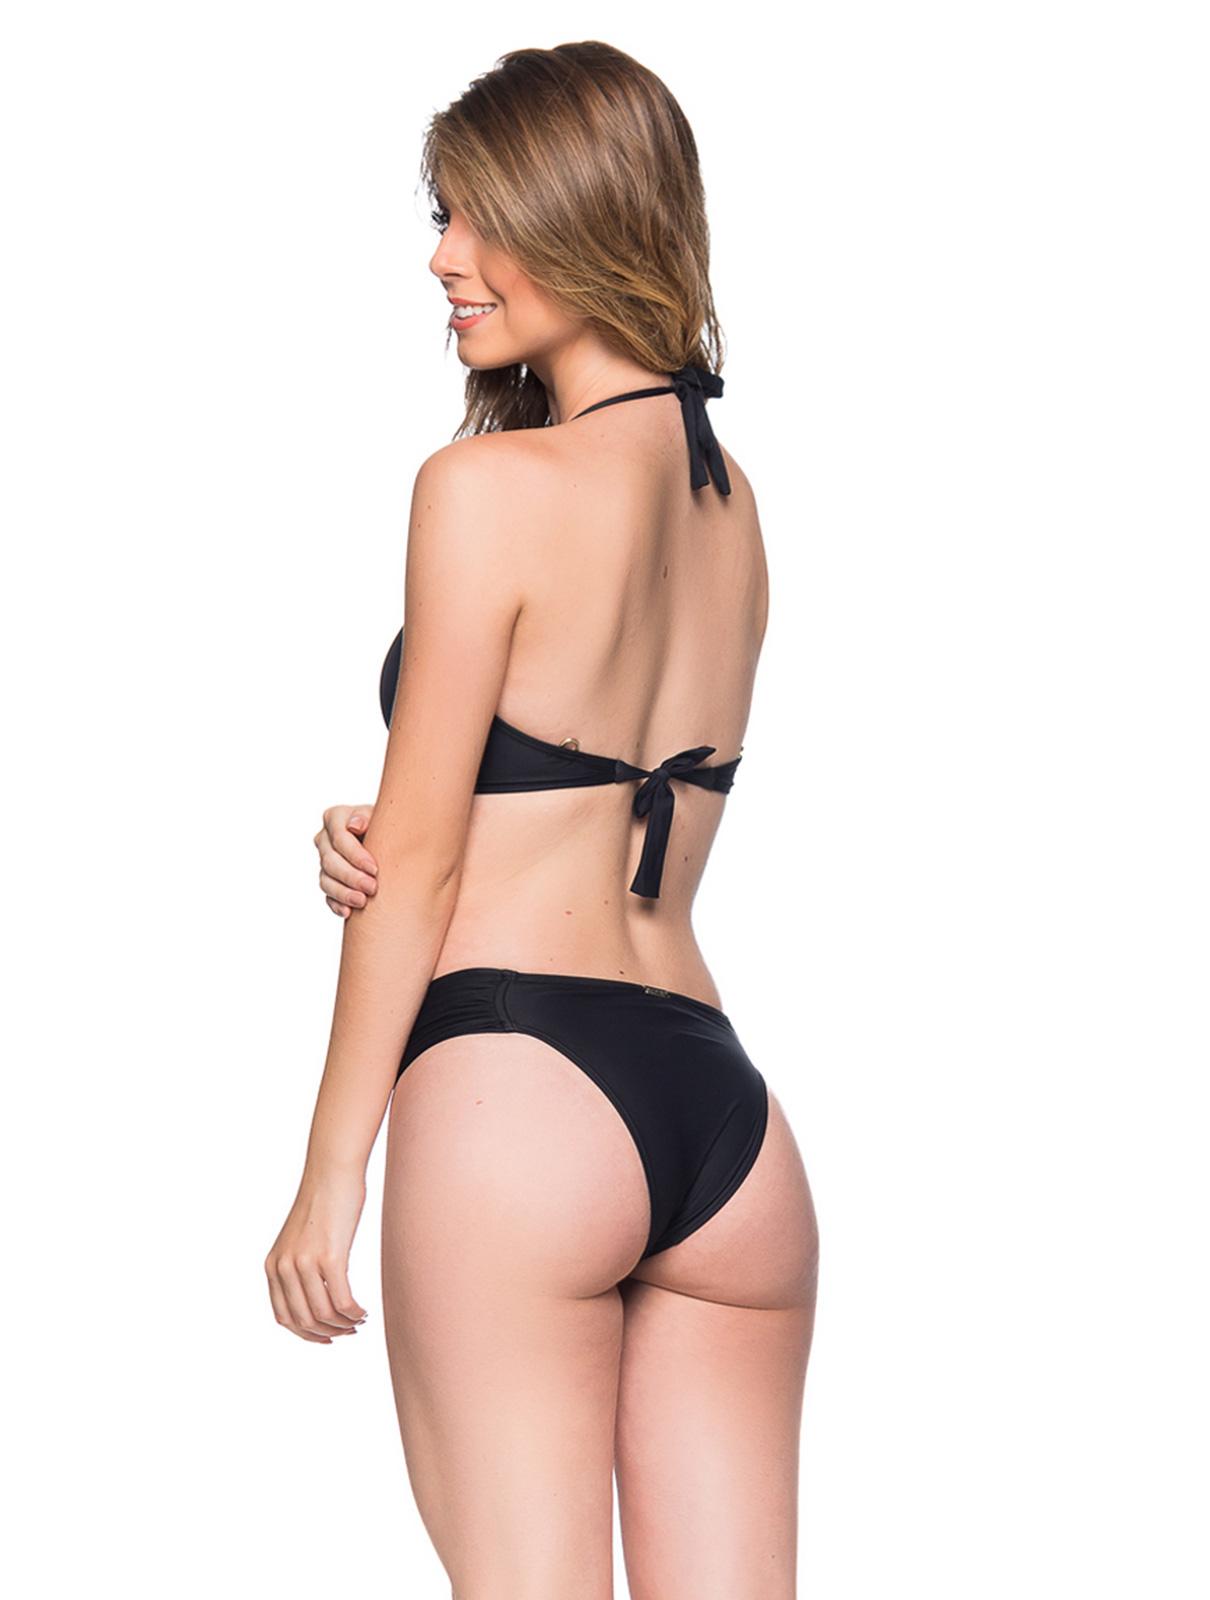 422b2fc6a2031 Black Halter Bikini With Tab Side Bottom And Stones - Drapeada Preto